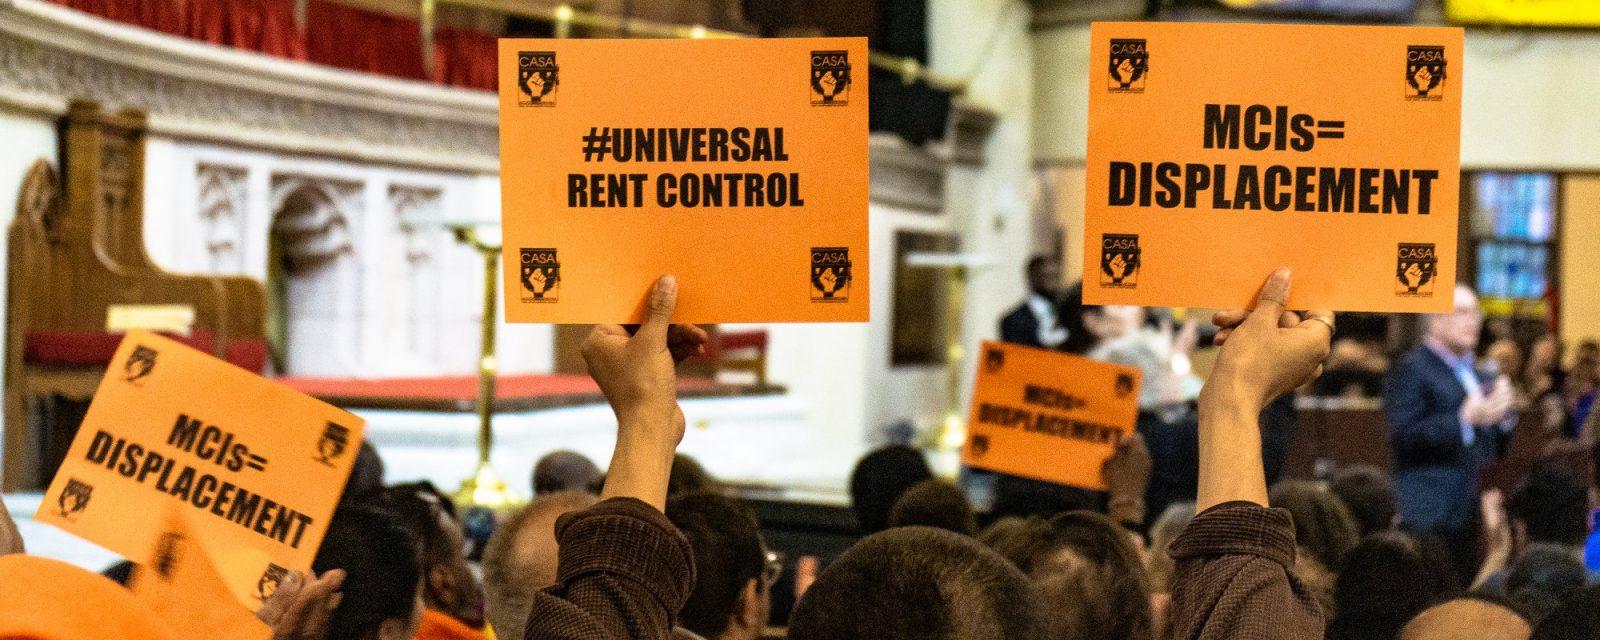 universal rent control campaign